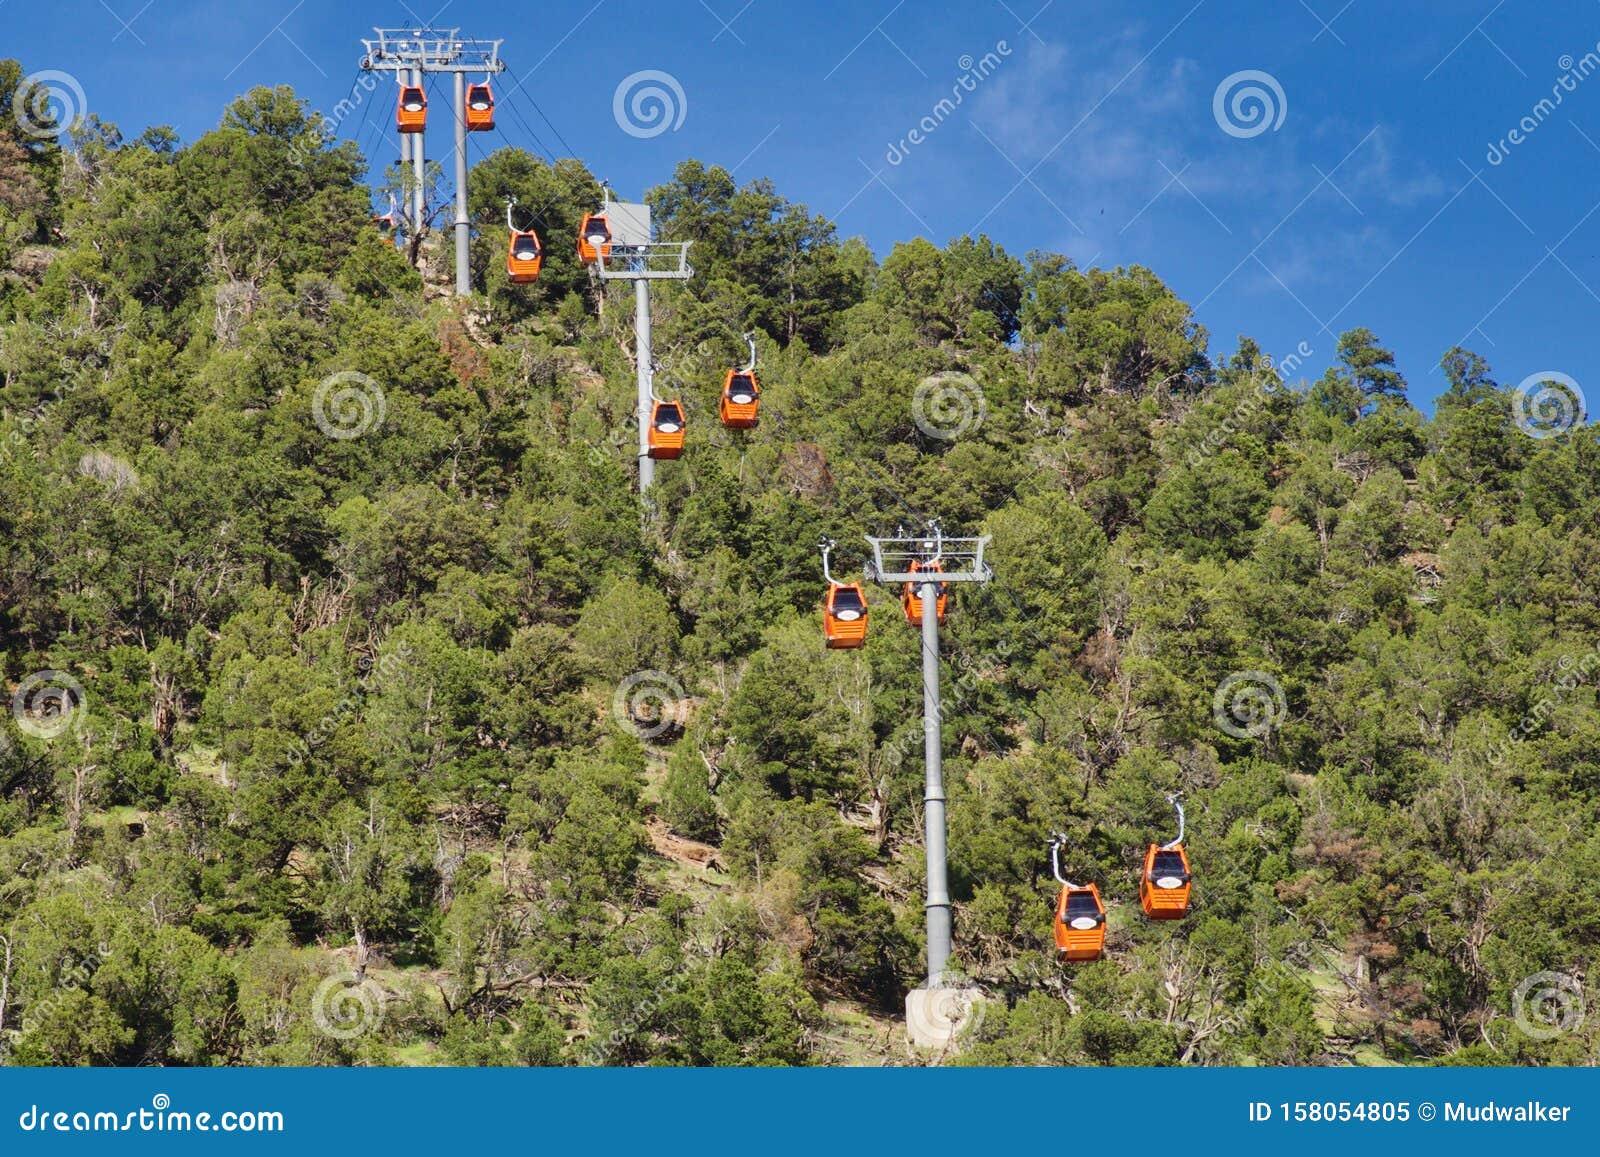 Colorado Adventure Activities Photos Free Royalty Free Stock Photos From Dreamstime